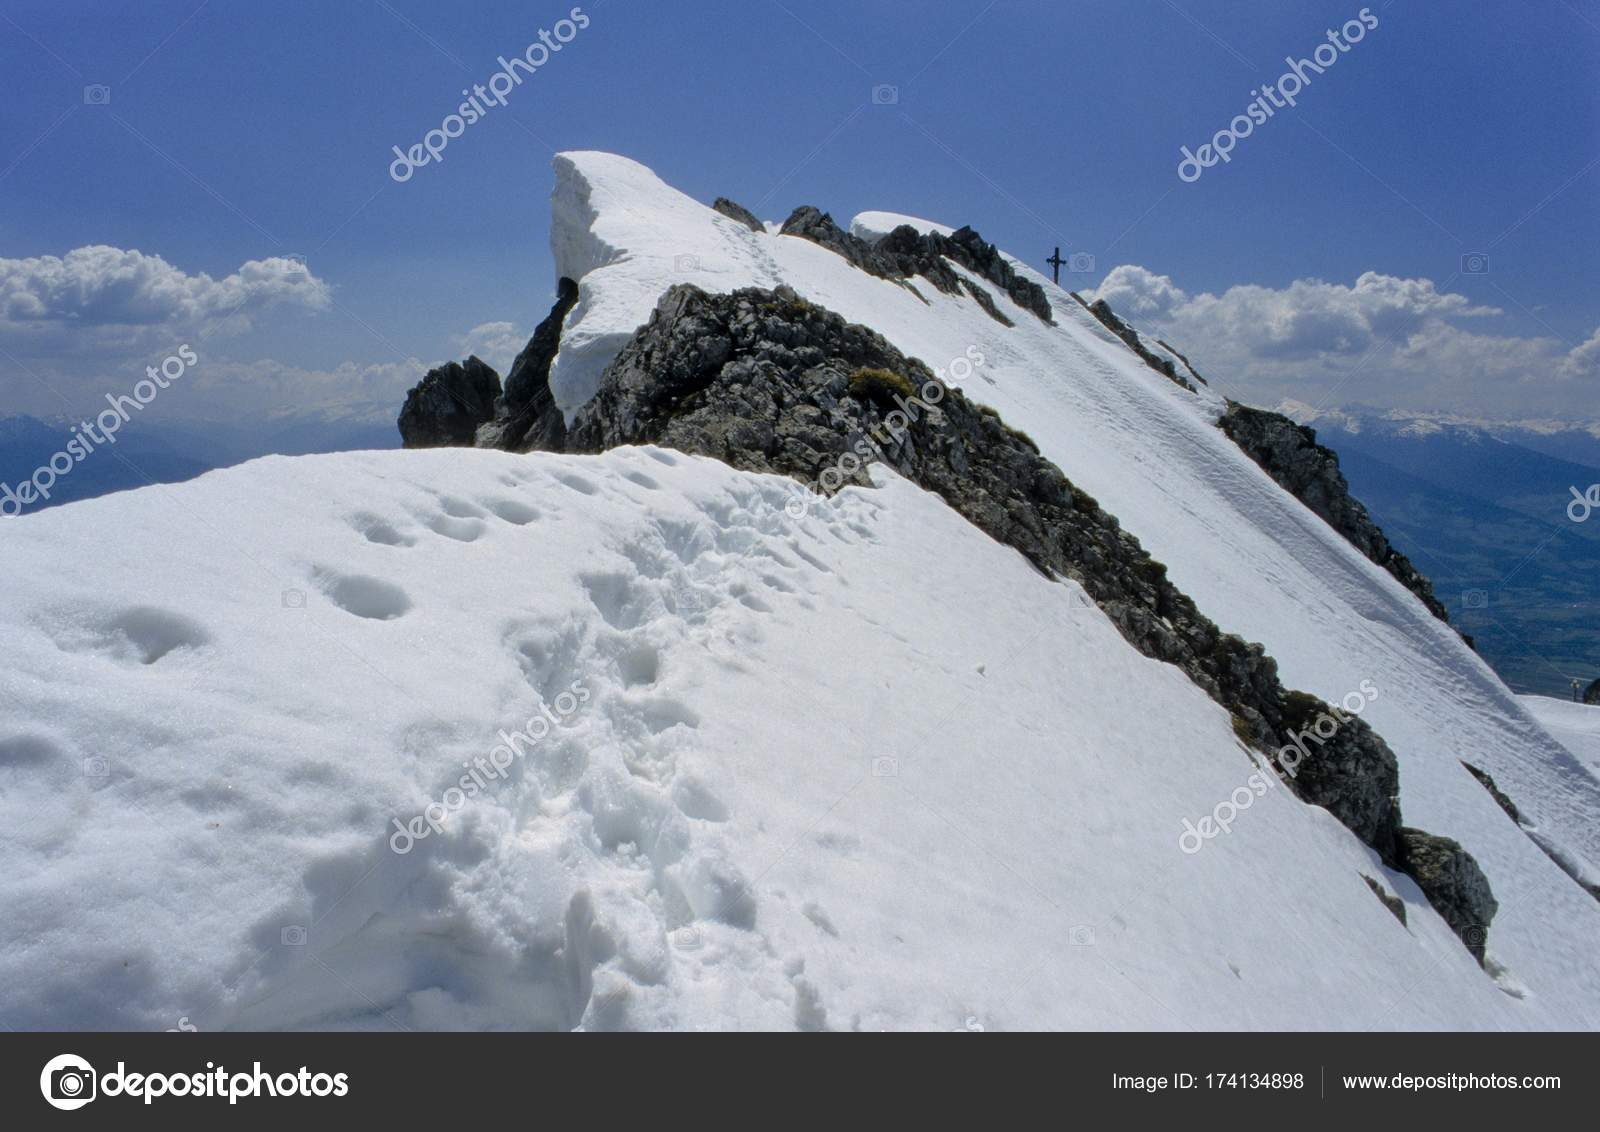 Klettersteig Innsbruck : Gipfelgrat spuren schnee innsbrucker klettersteig innsbruck fixiert